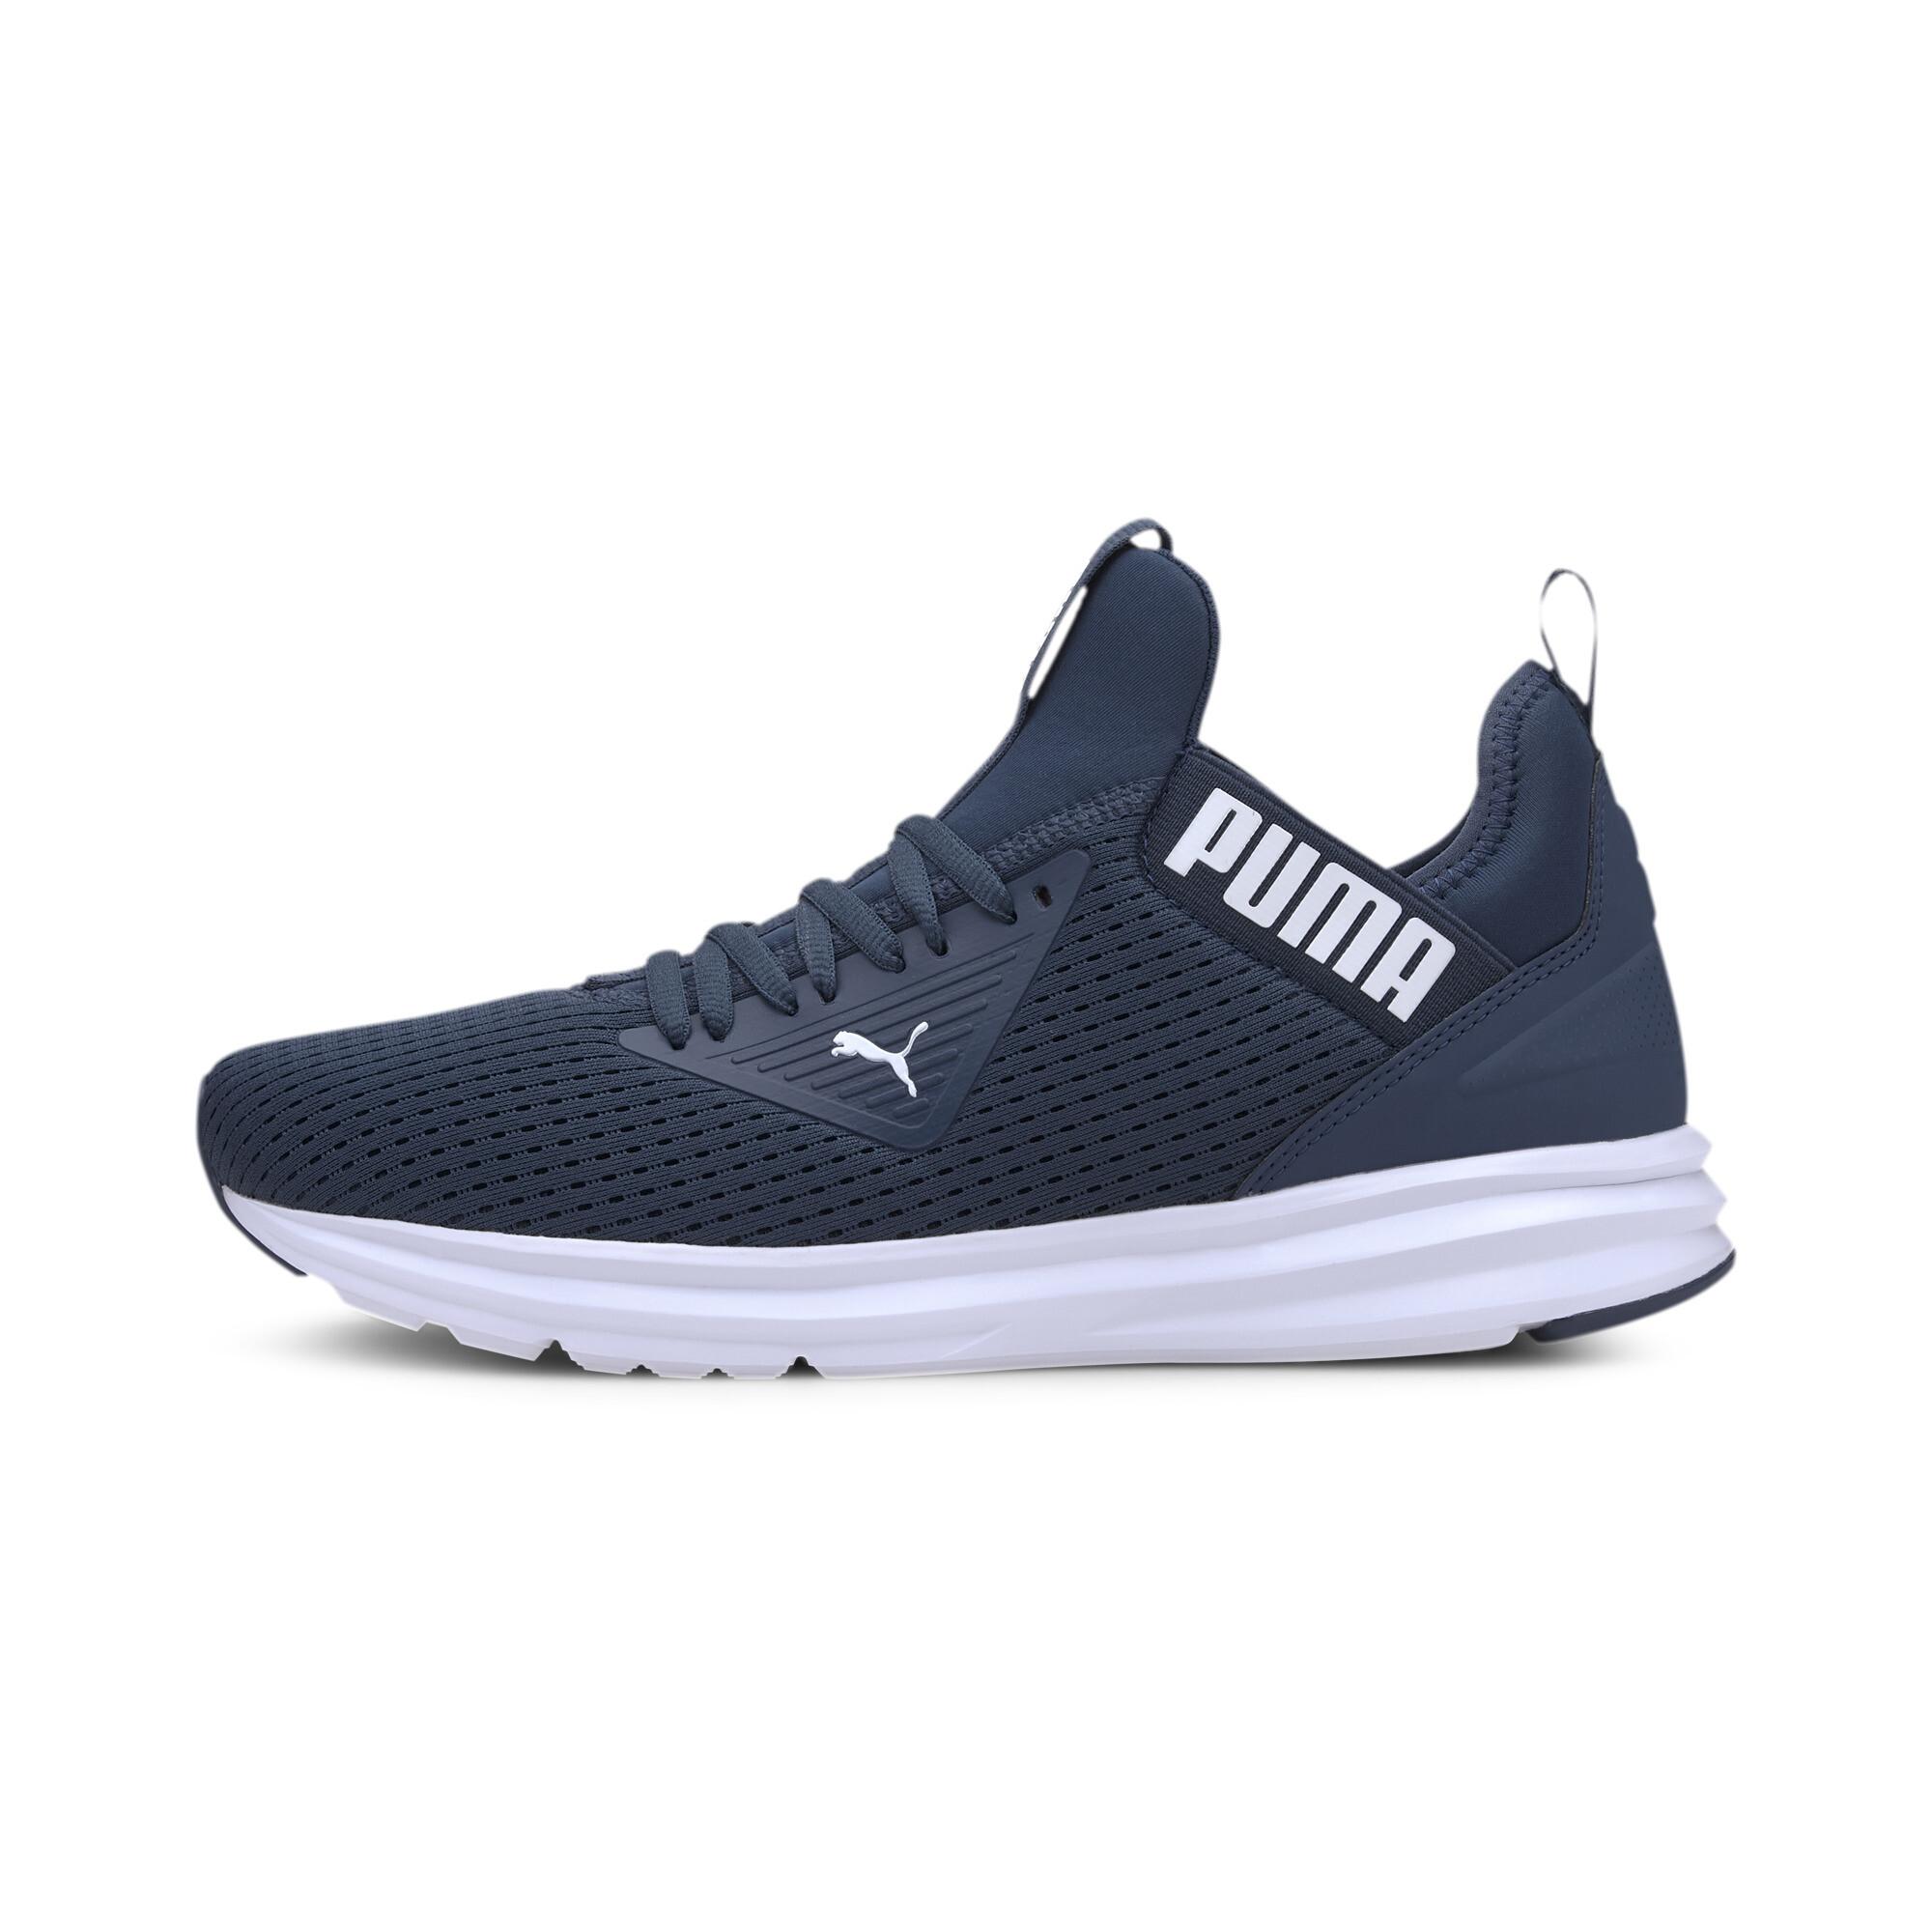 PUMA-Men-039-s-Enzo-Beta-Mesh-Training-Shoes thumbnail 18